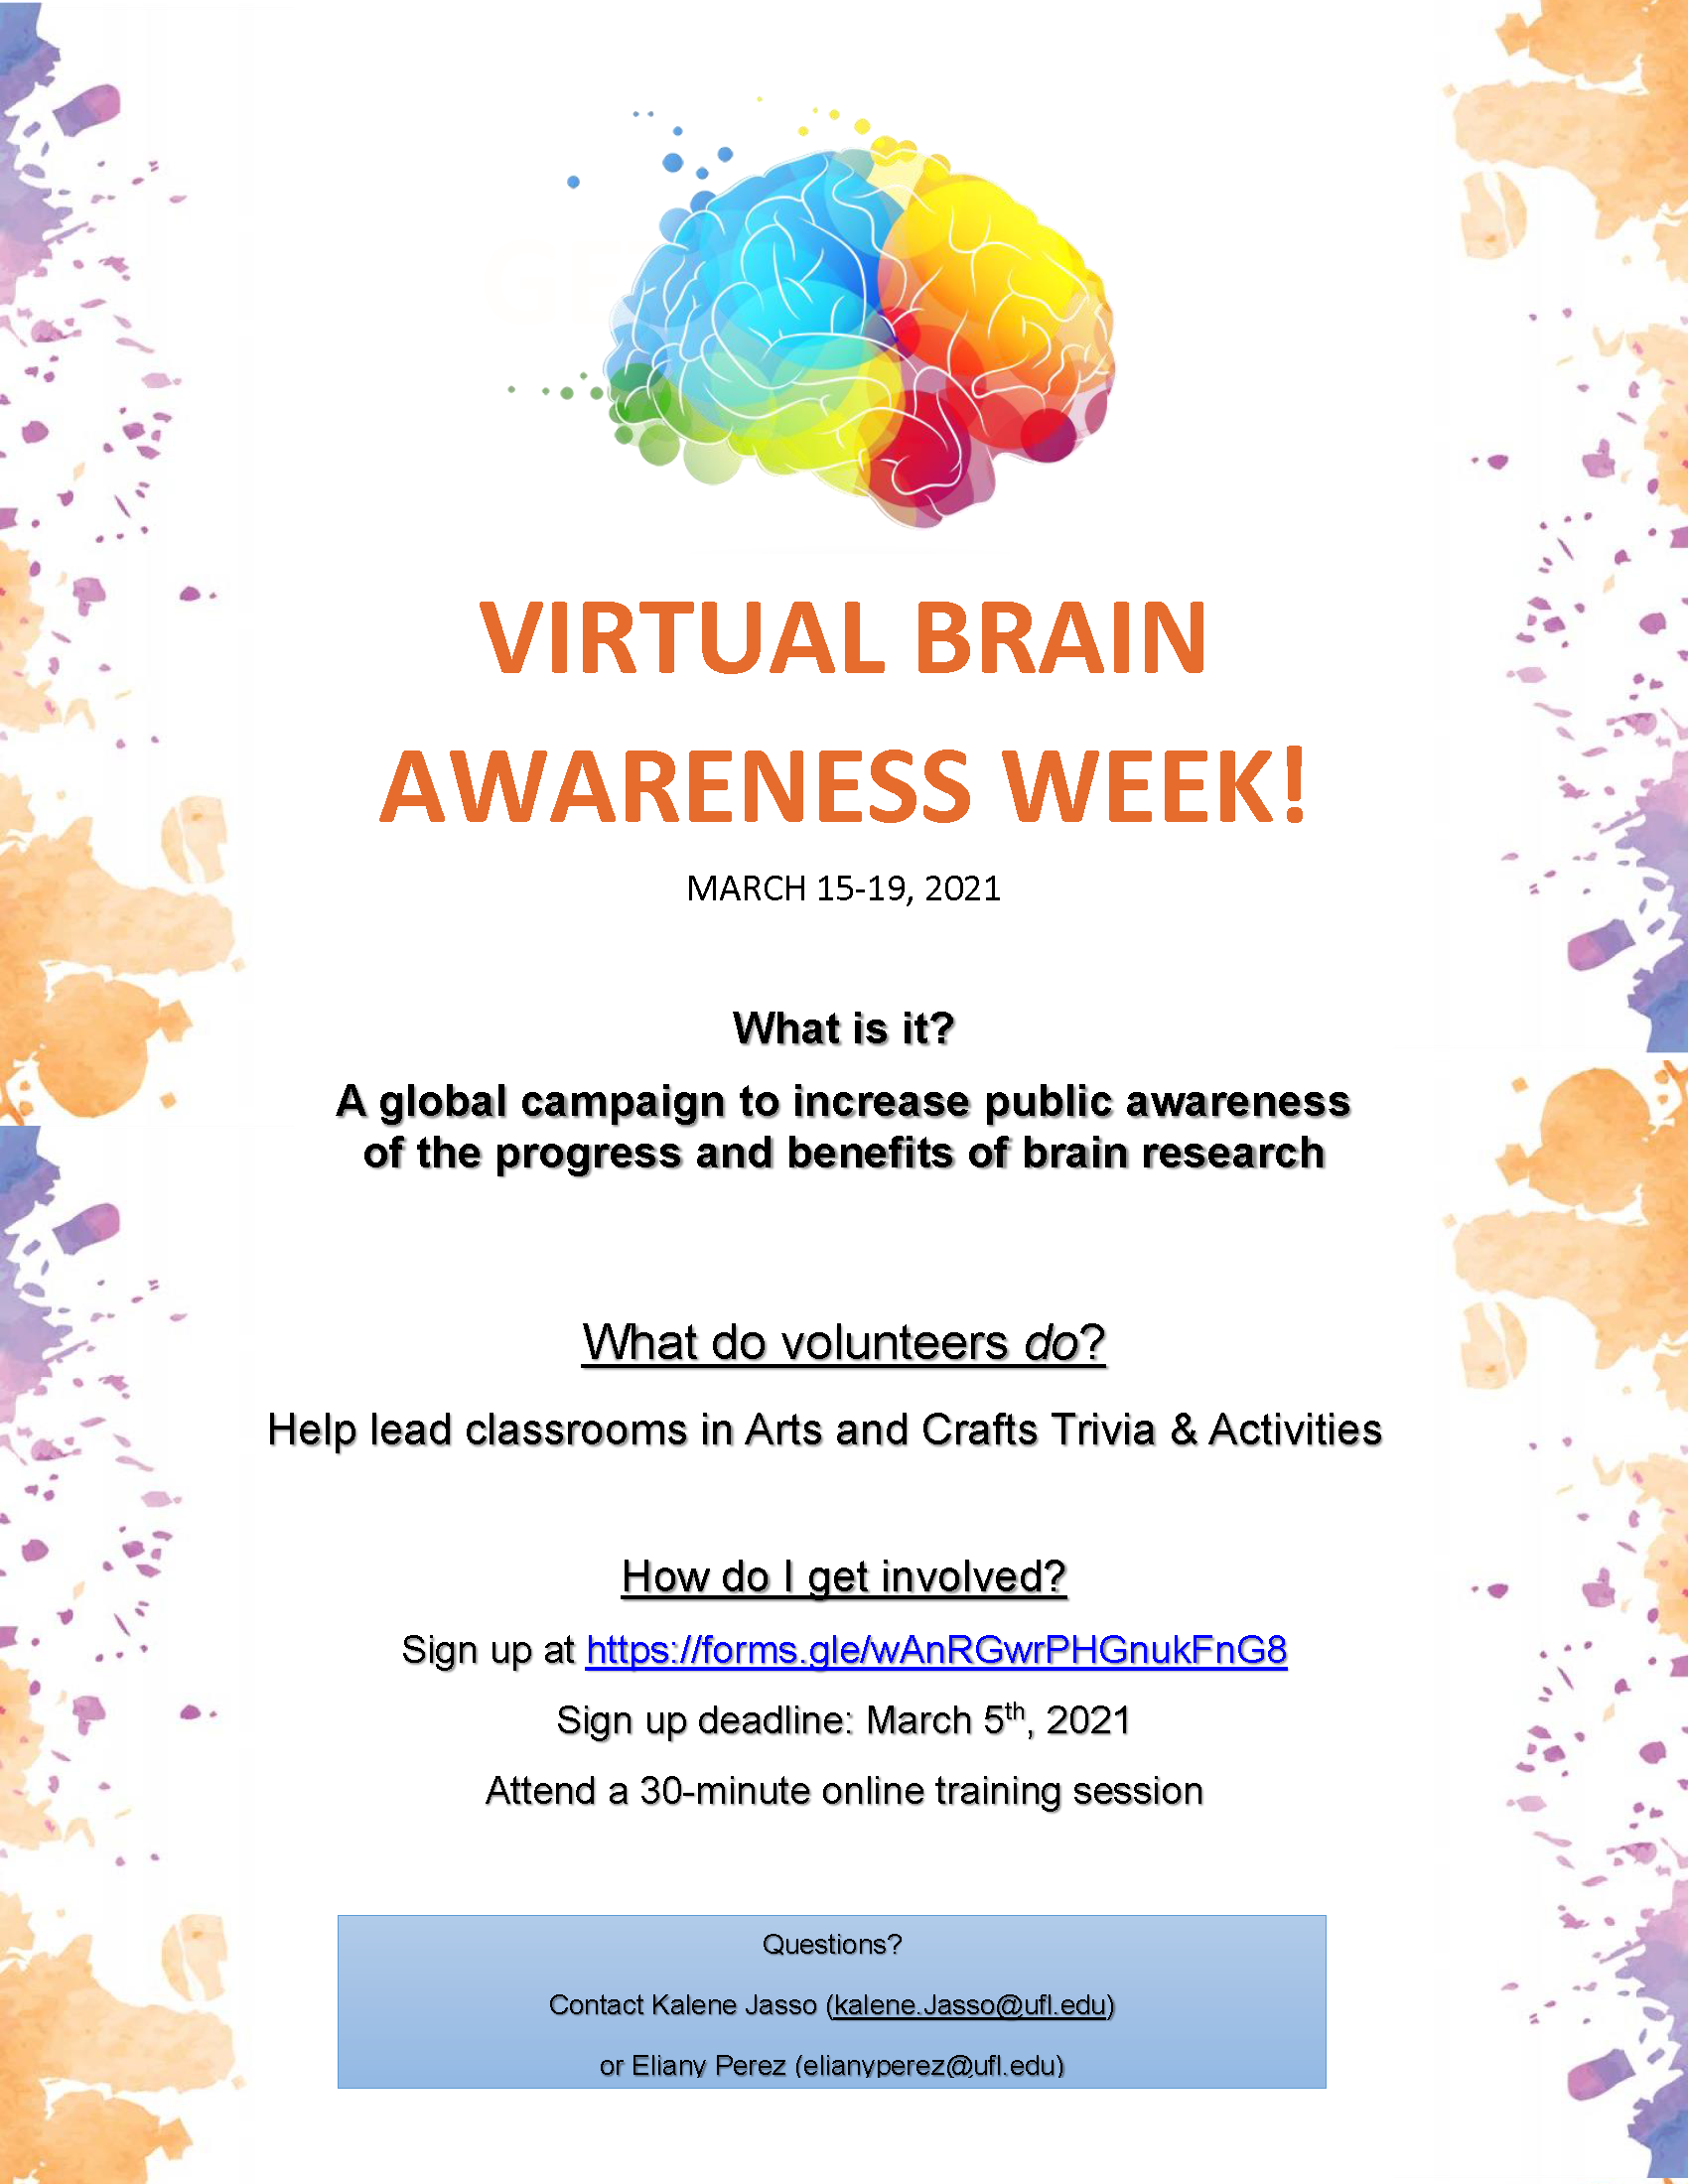 Volunteer for Brain awareness week! Click the link below to sign up.